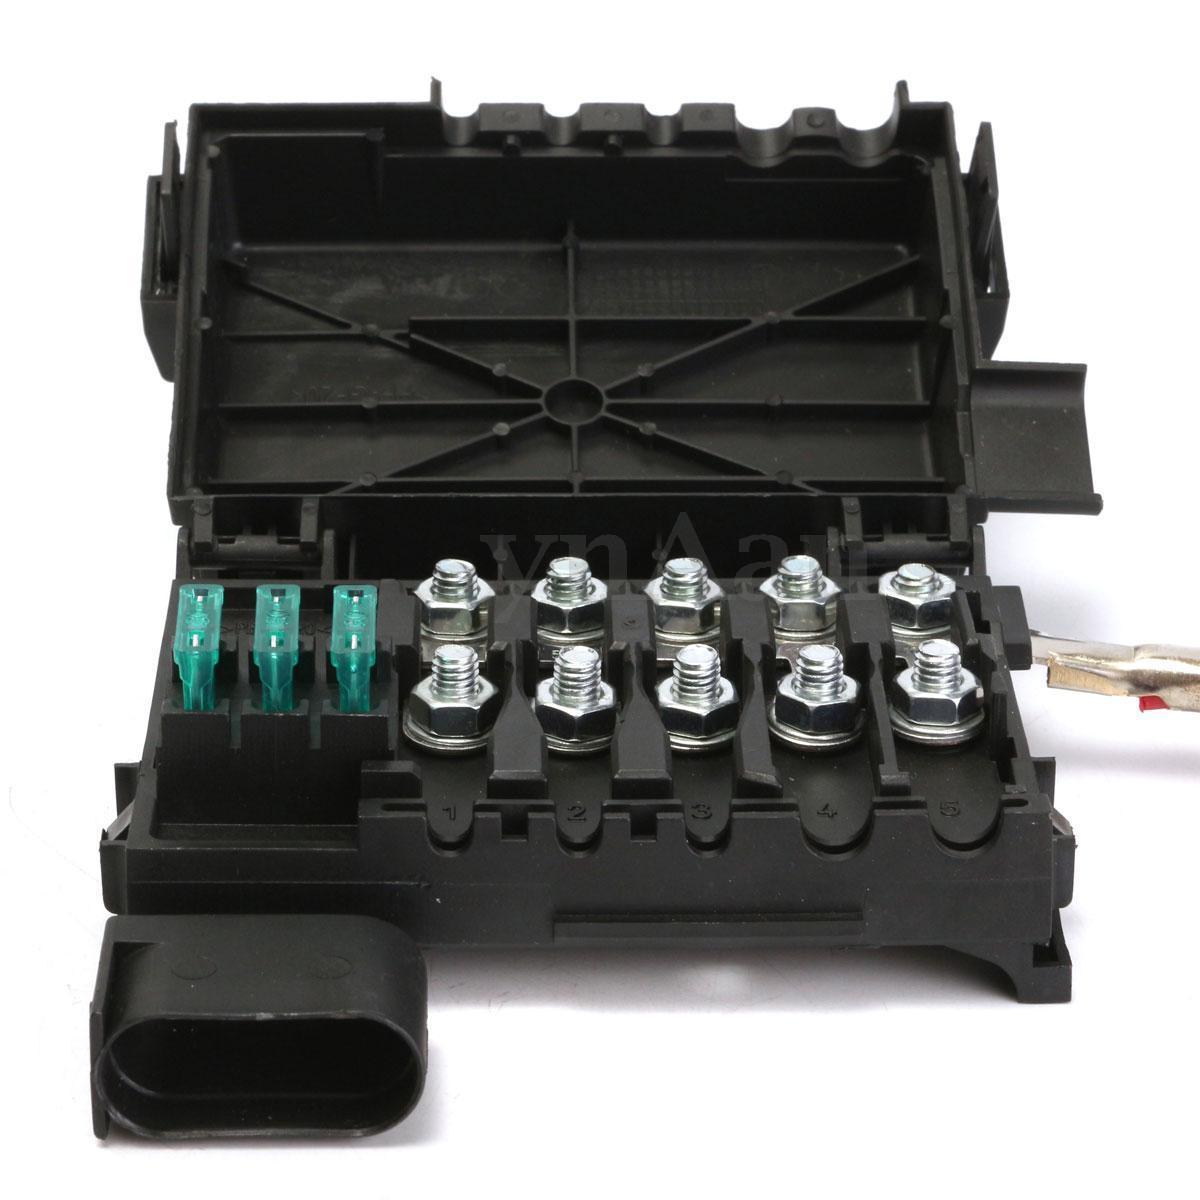 Caixa Fusivel Rele Bateria Golf Audi A3 Bora Passat Beetle de 1998 a 2013